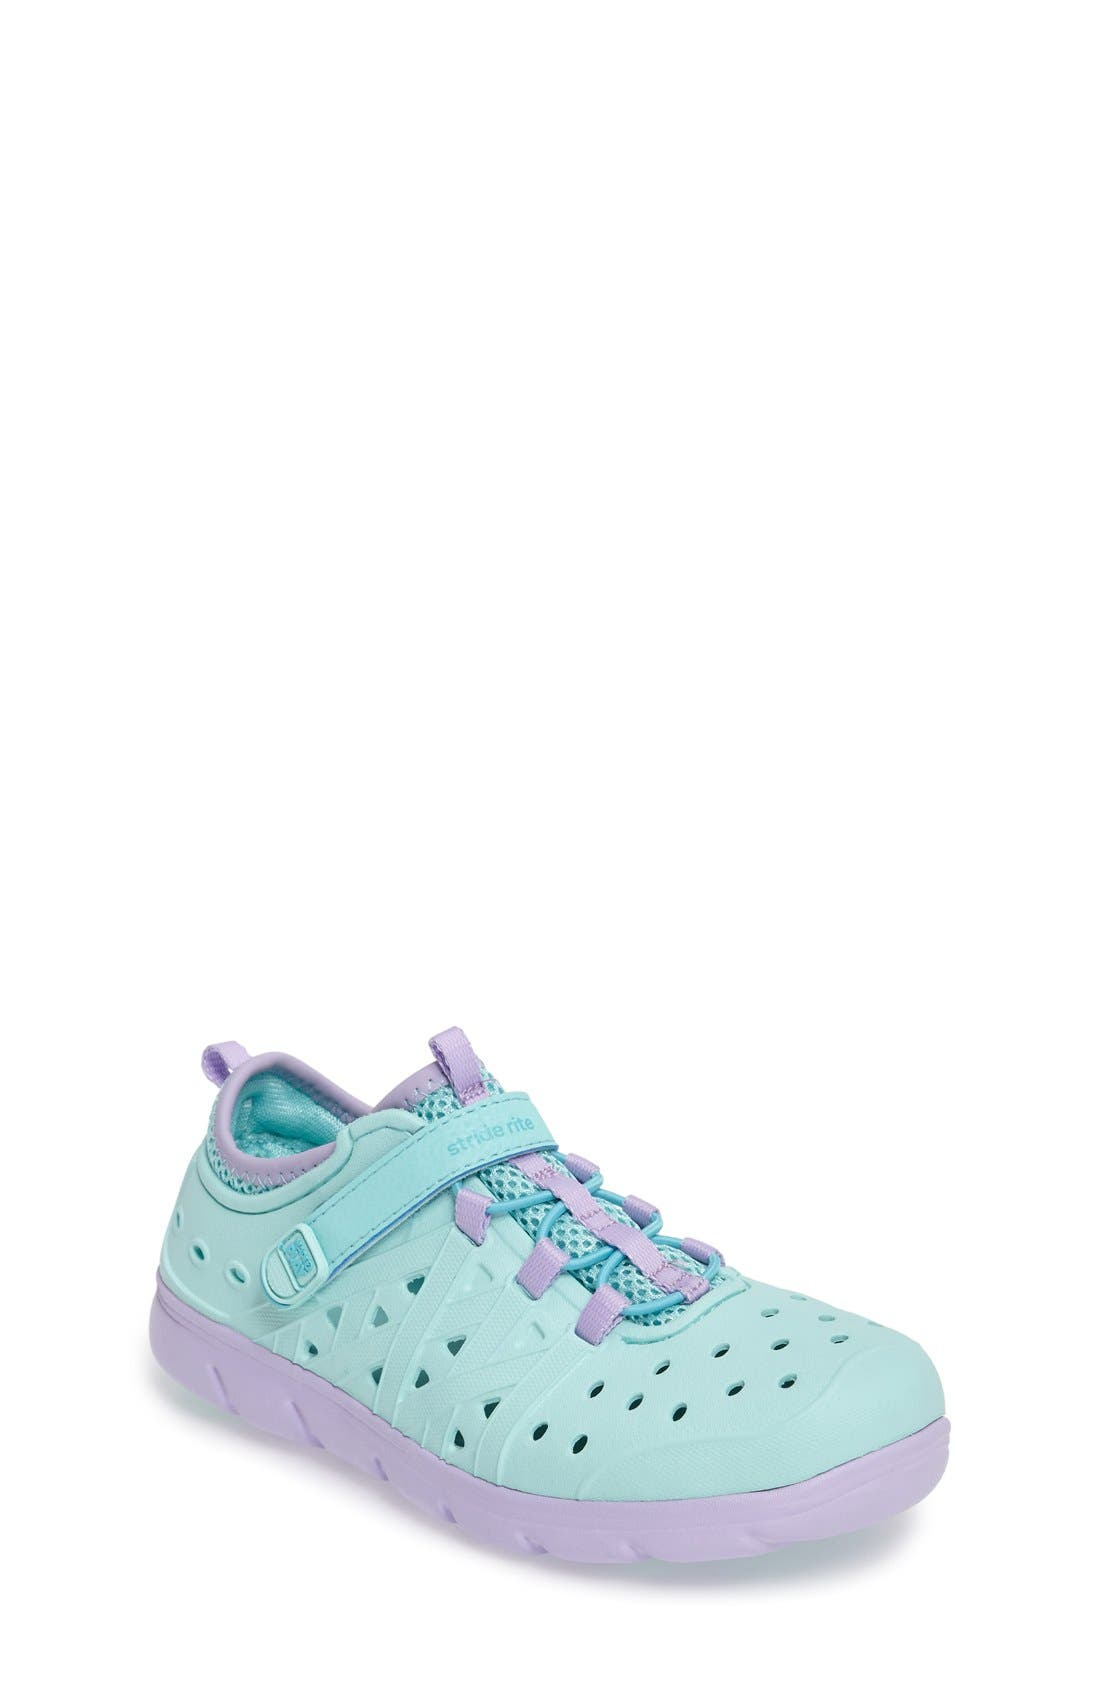 Alternate Image 1 Selected - Stride Rite Made2Play® Phibian Sneaker (Baby, Walker, Toddler & Little Kid)